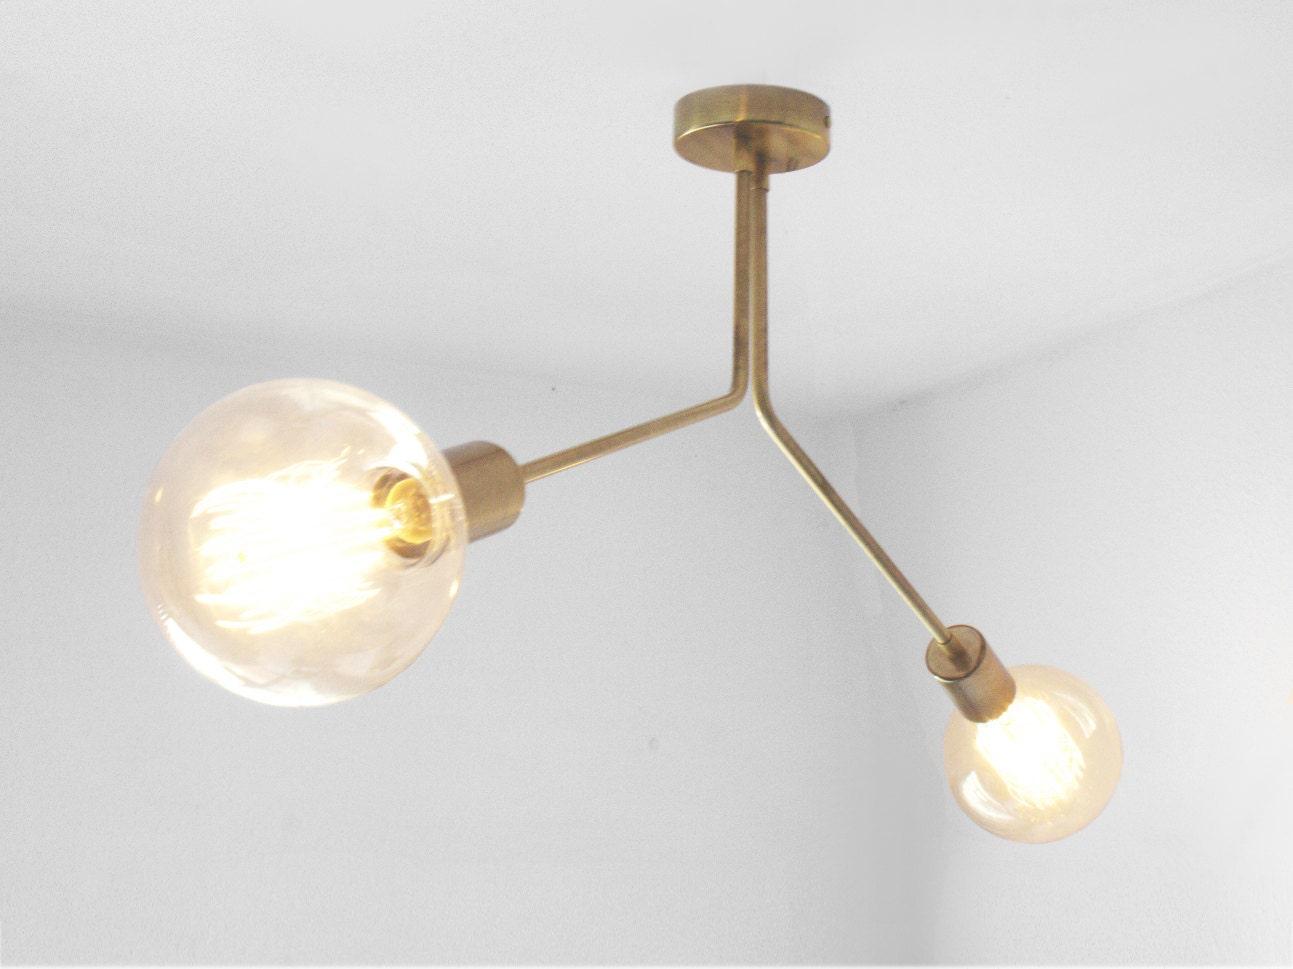 Semi Flush Ceiling Lights Glass Brass Fixture Bathroom: Brass Mid Century 2 Arm Ceiling Semi Flush Mount / Wall